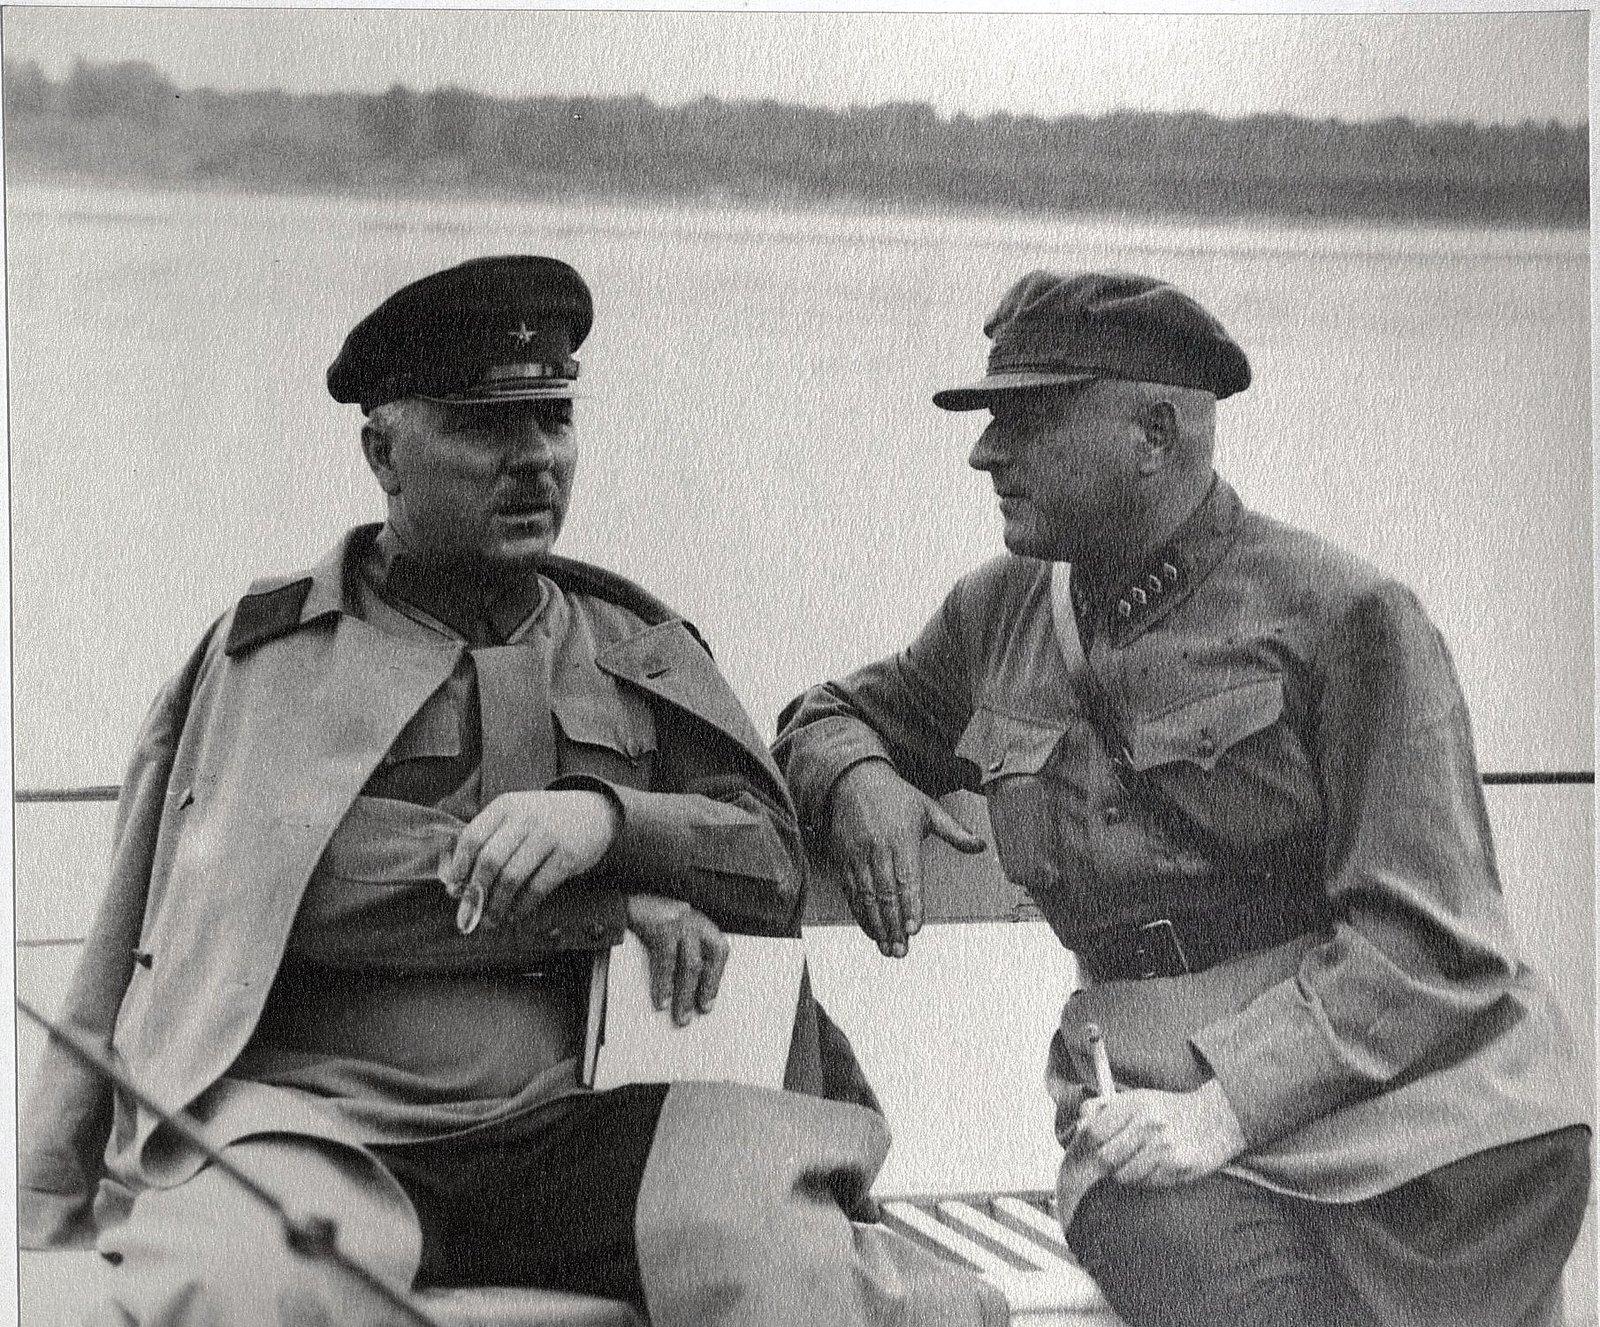 29. К.Е. Ворошилов и Н.С. Власик. Теплоход Клара Цеткин. Август 1933